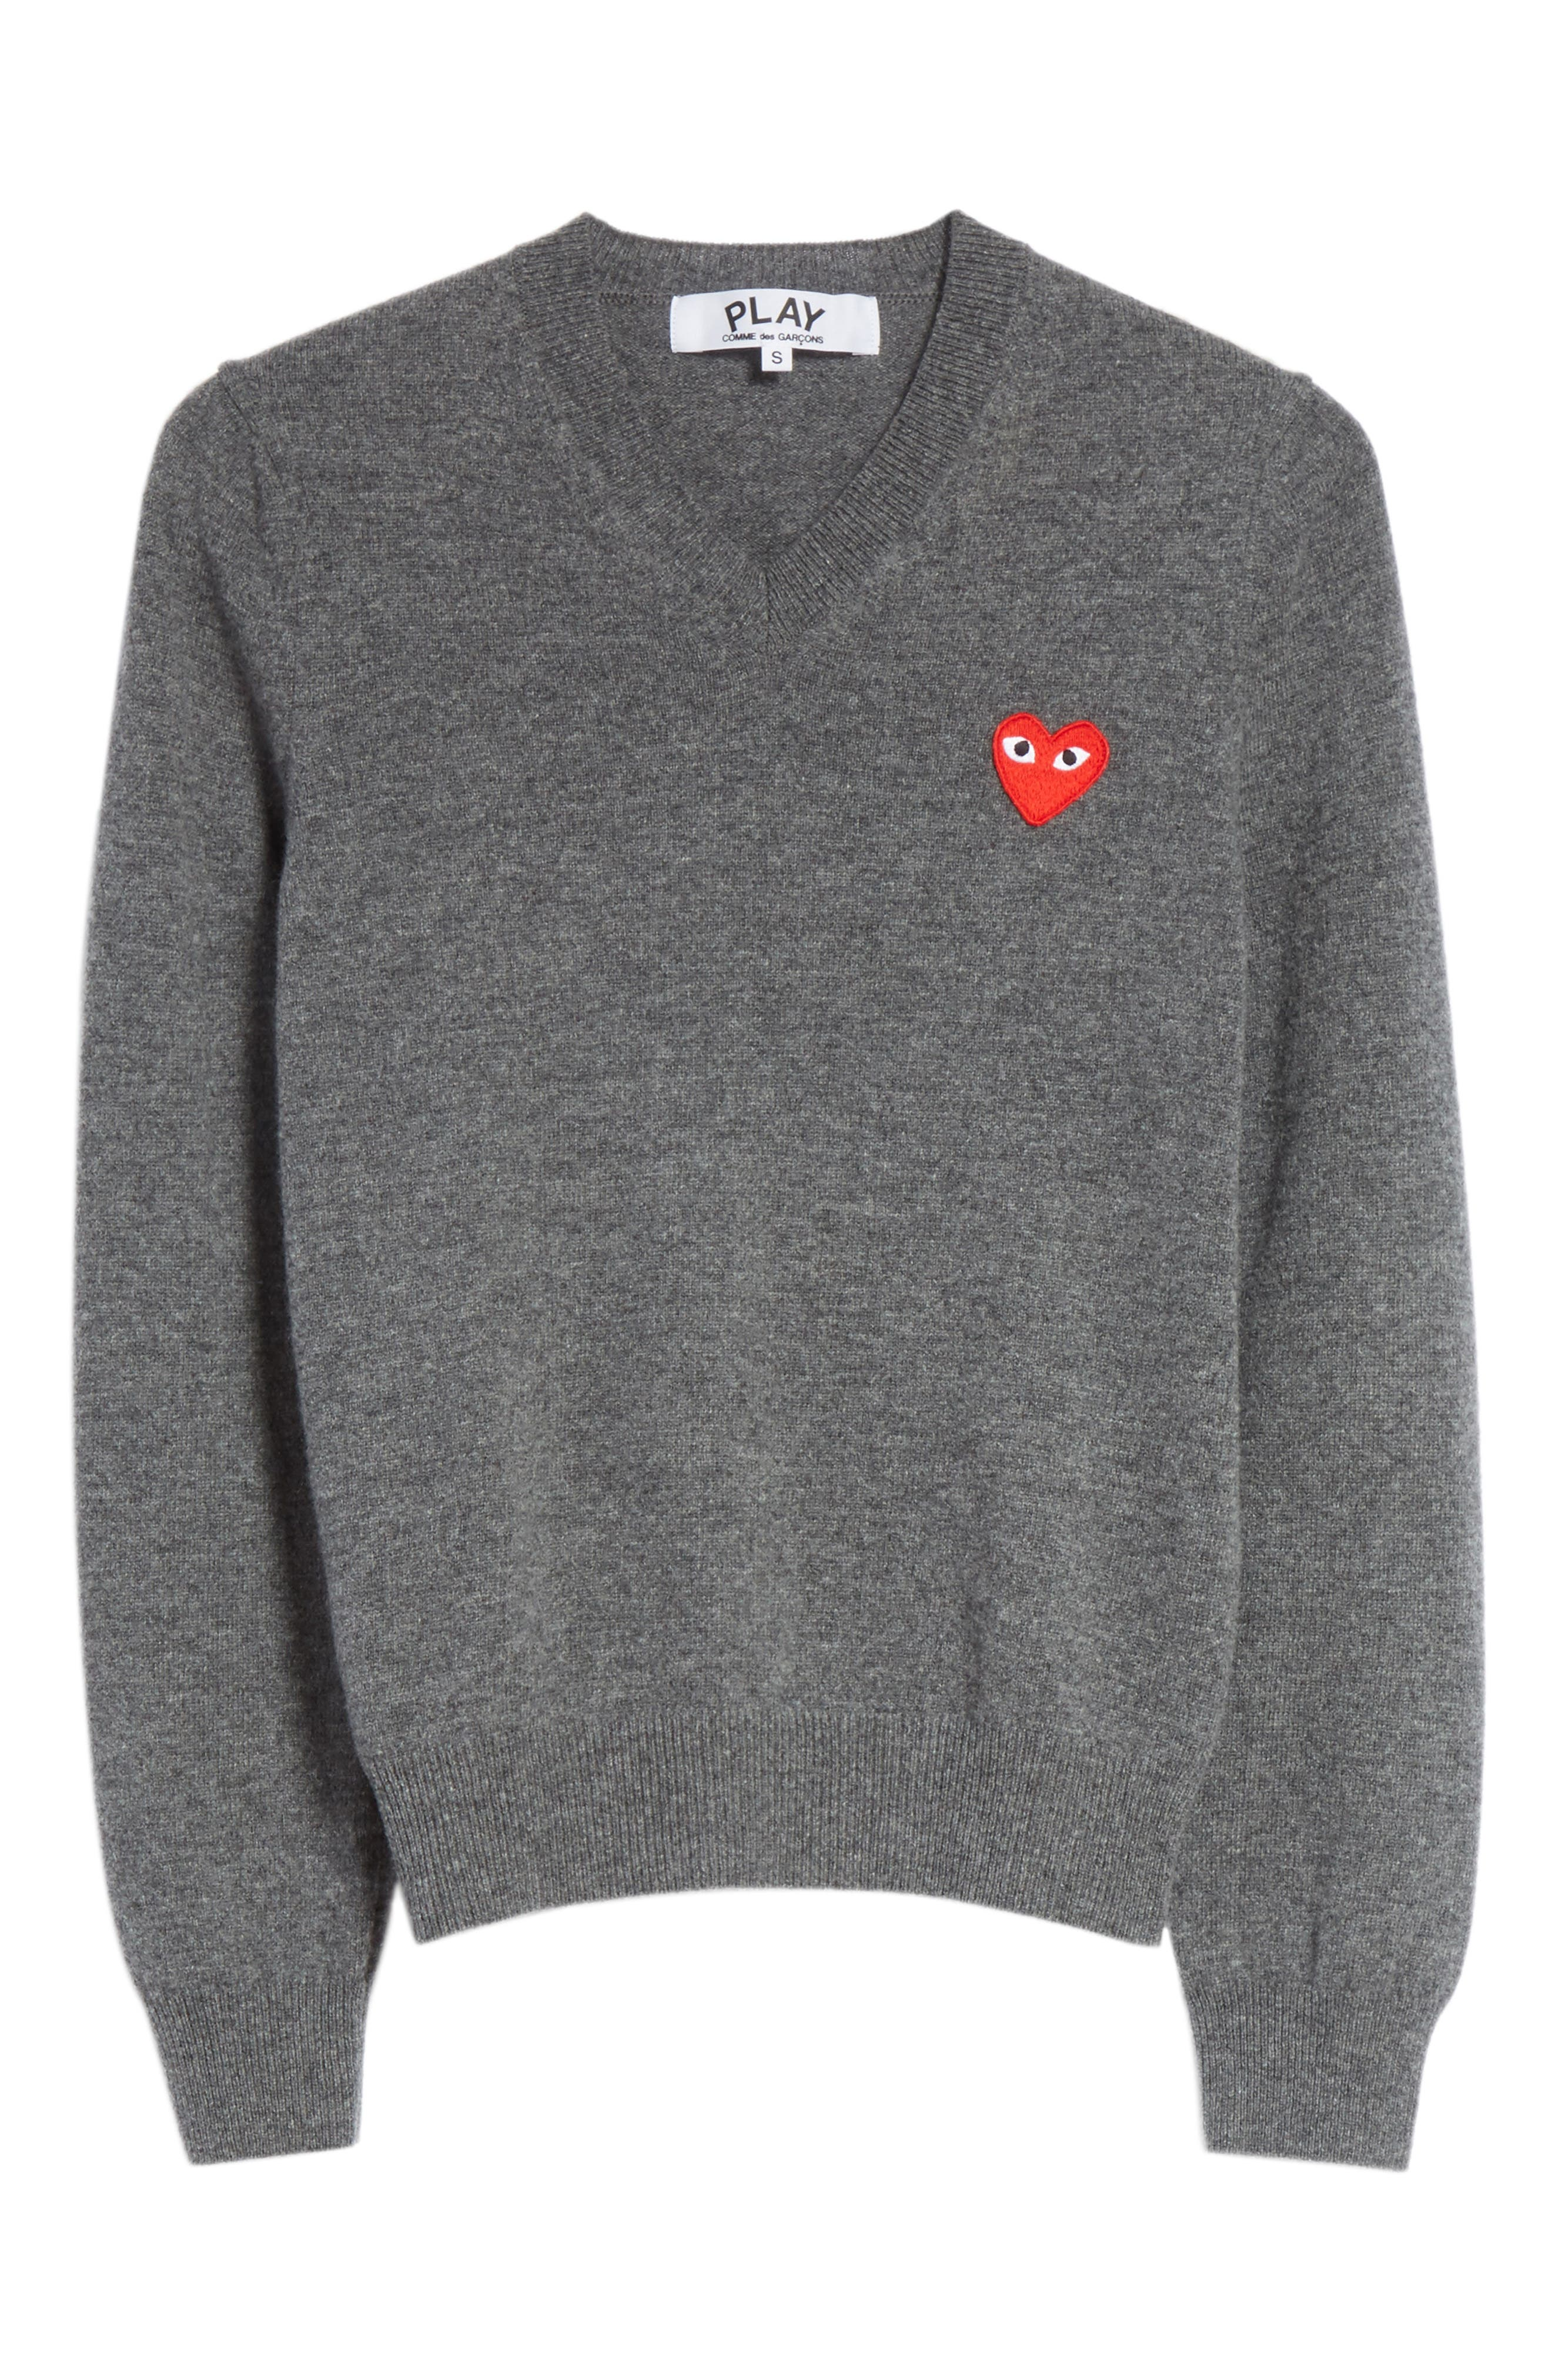 Wool V-Neck Sweater,                             Alternate thumbnail 6, color,                             GREY